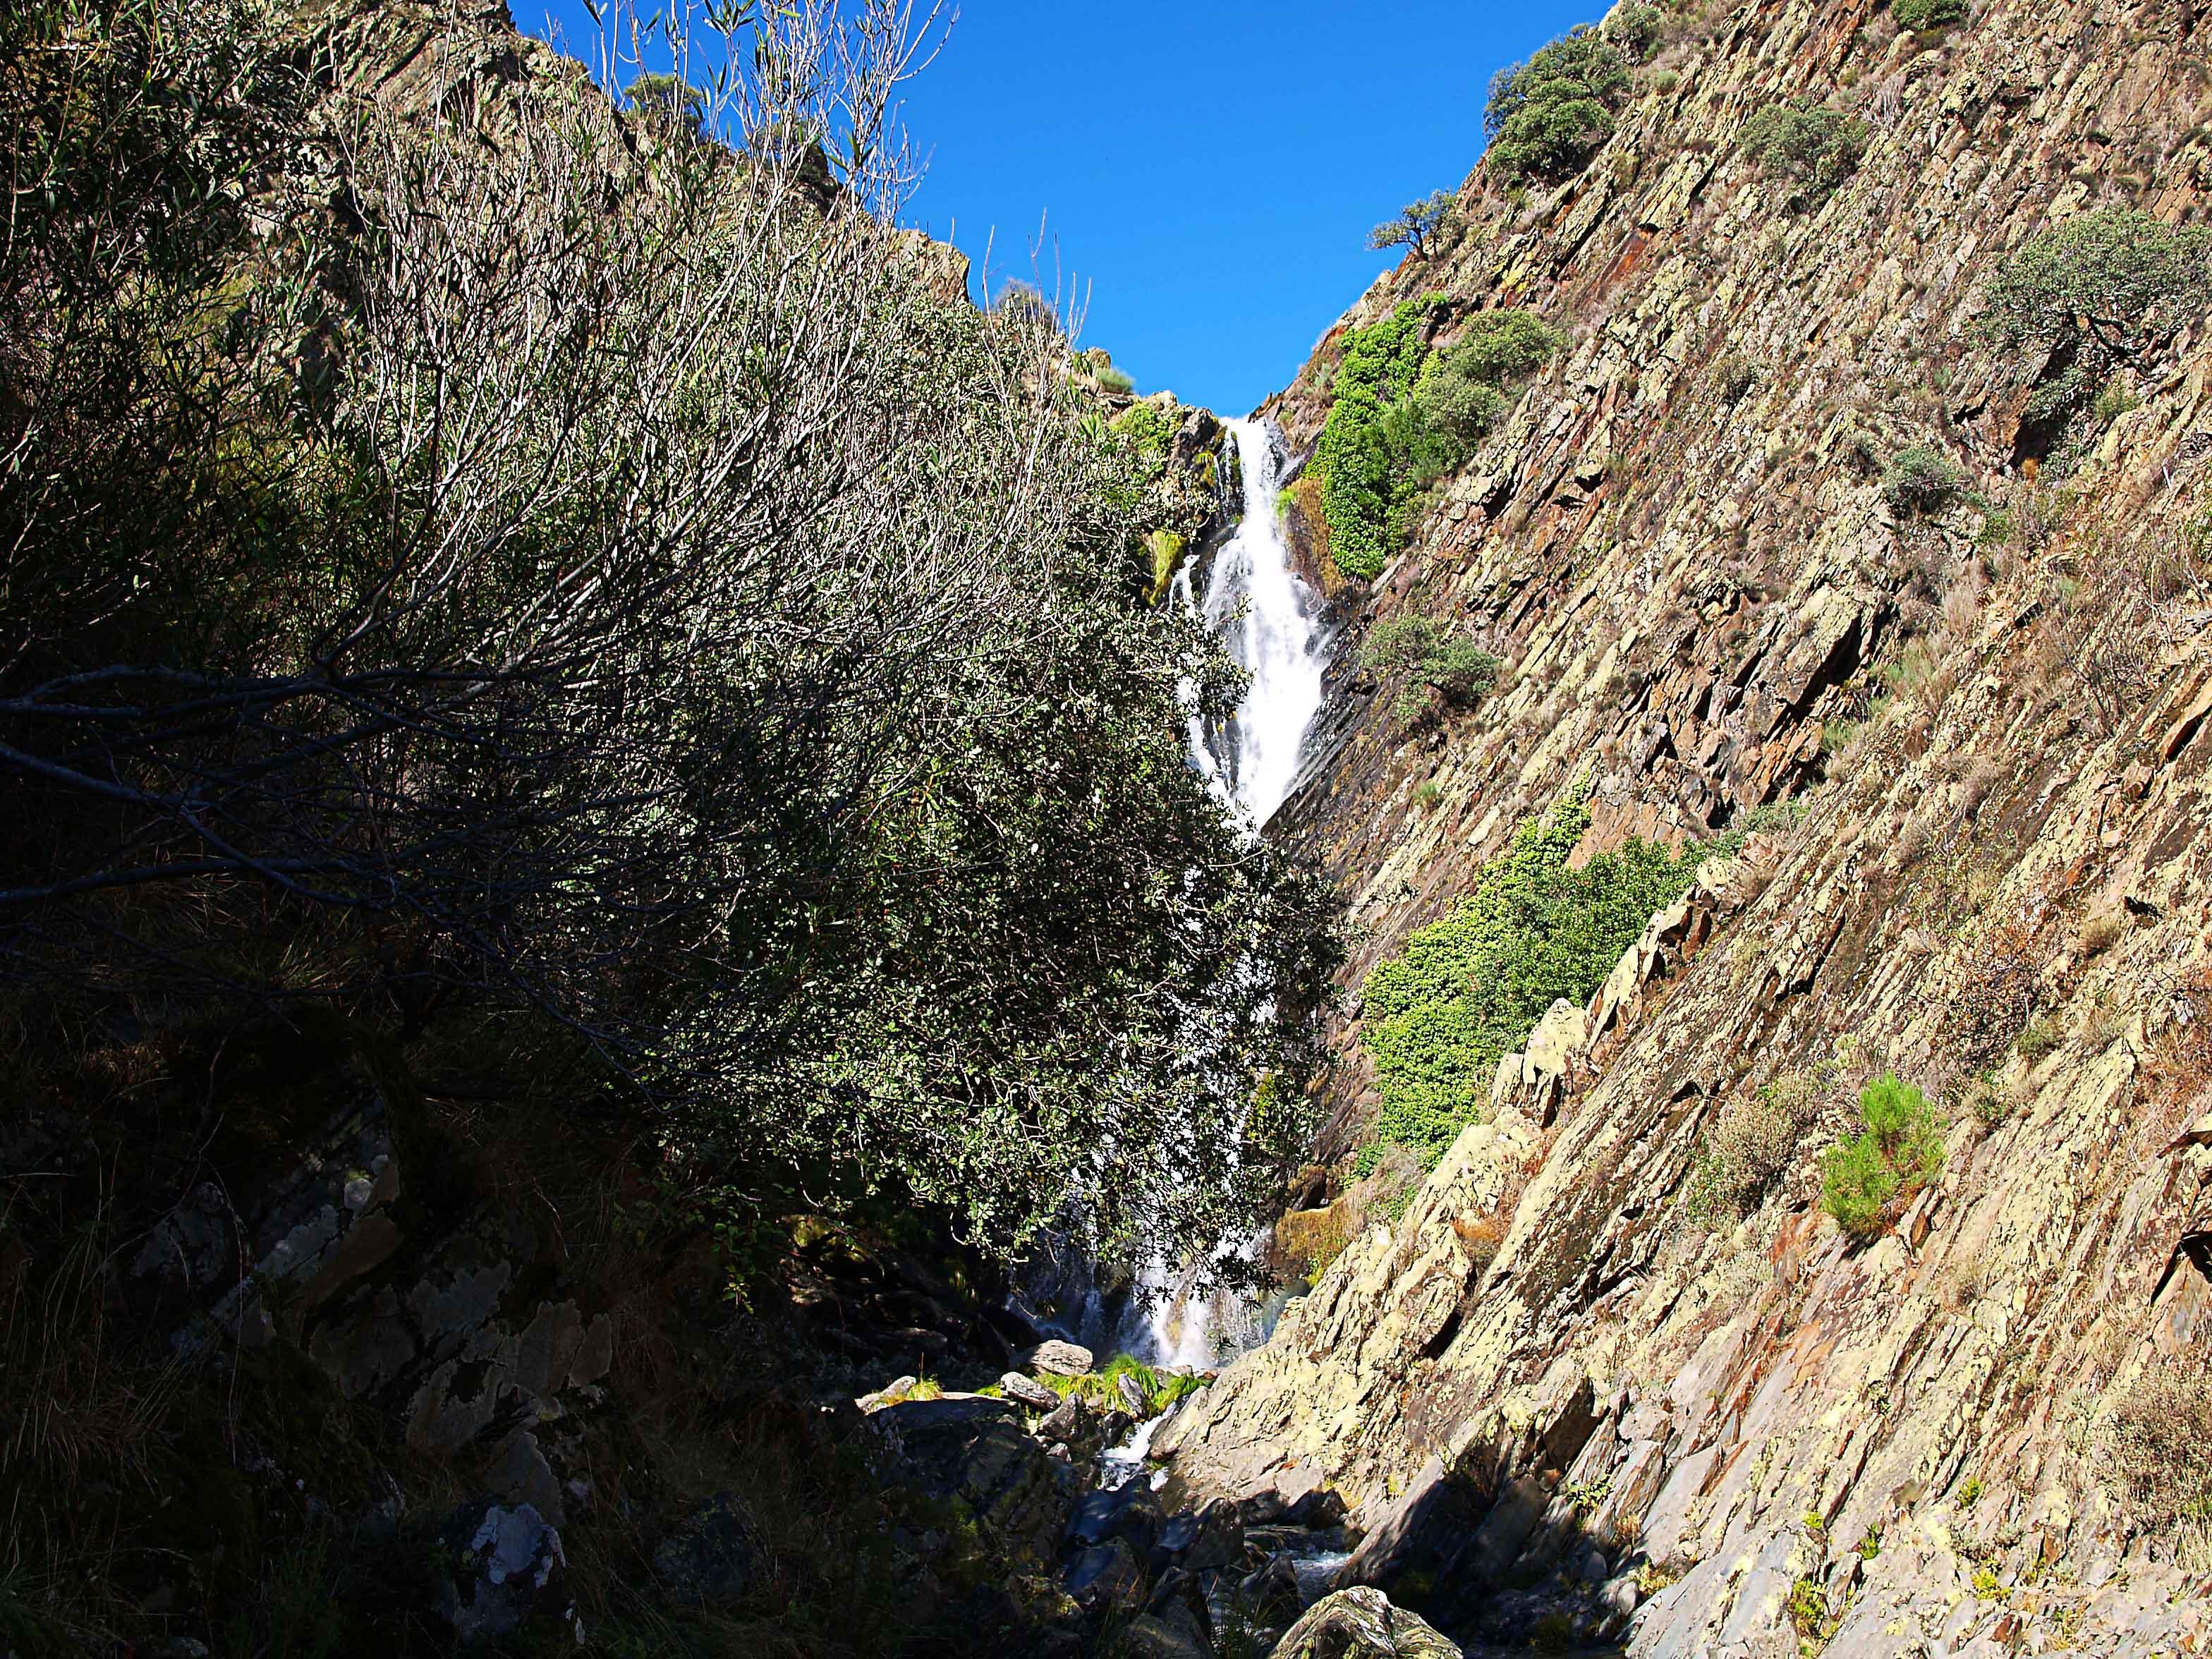 Ruta El Chorrituelo en Ovejuela. las Hurdes